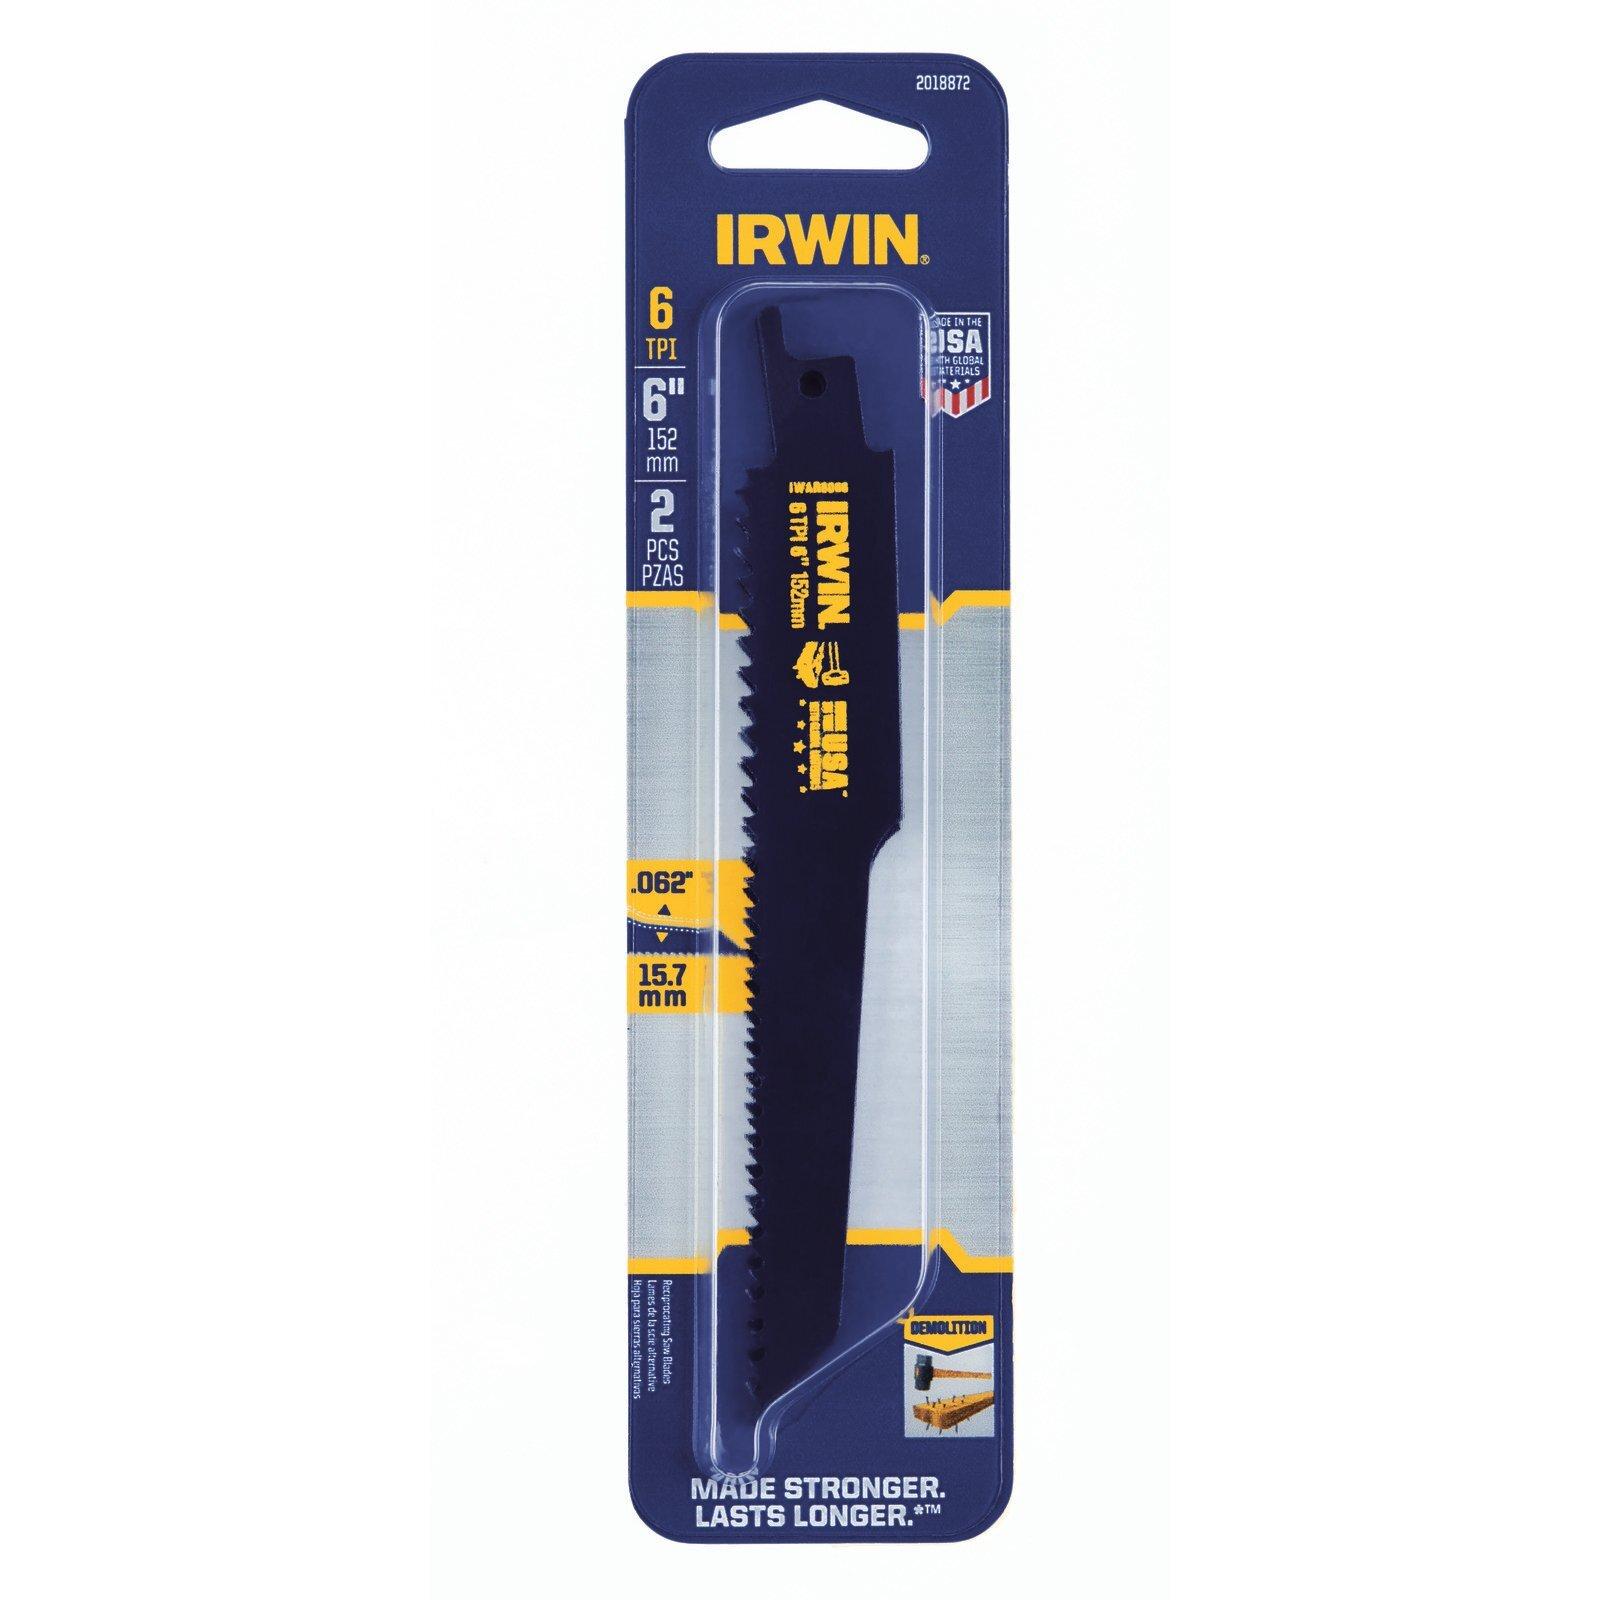 "Irwin 6"" 6TPI Demo Recip Blade - 2 Pack"